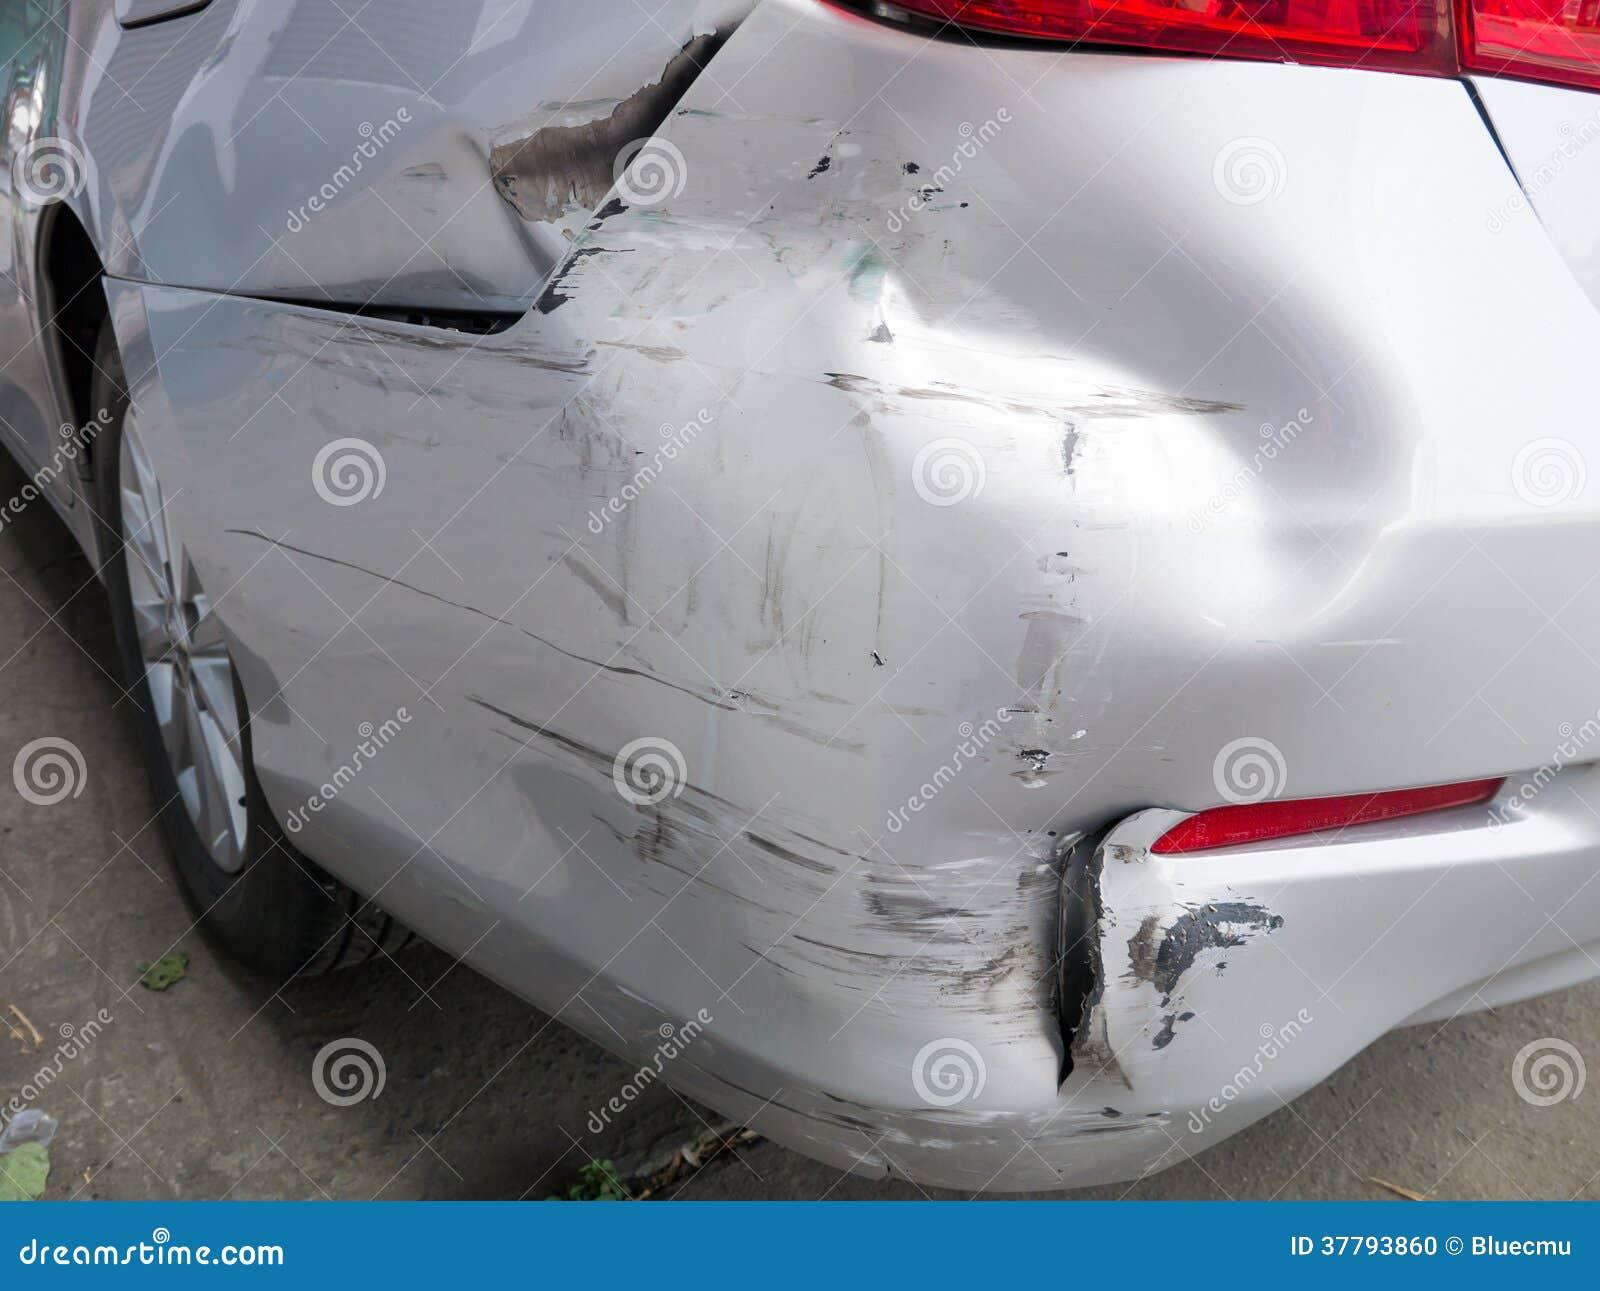 Car bumper damage